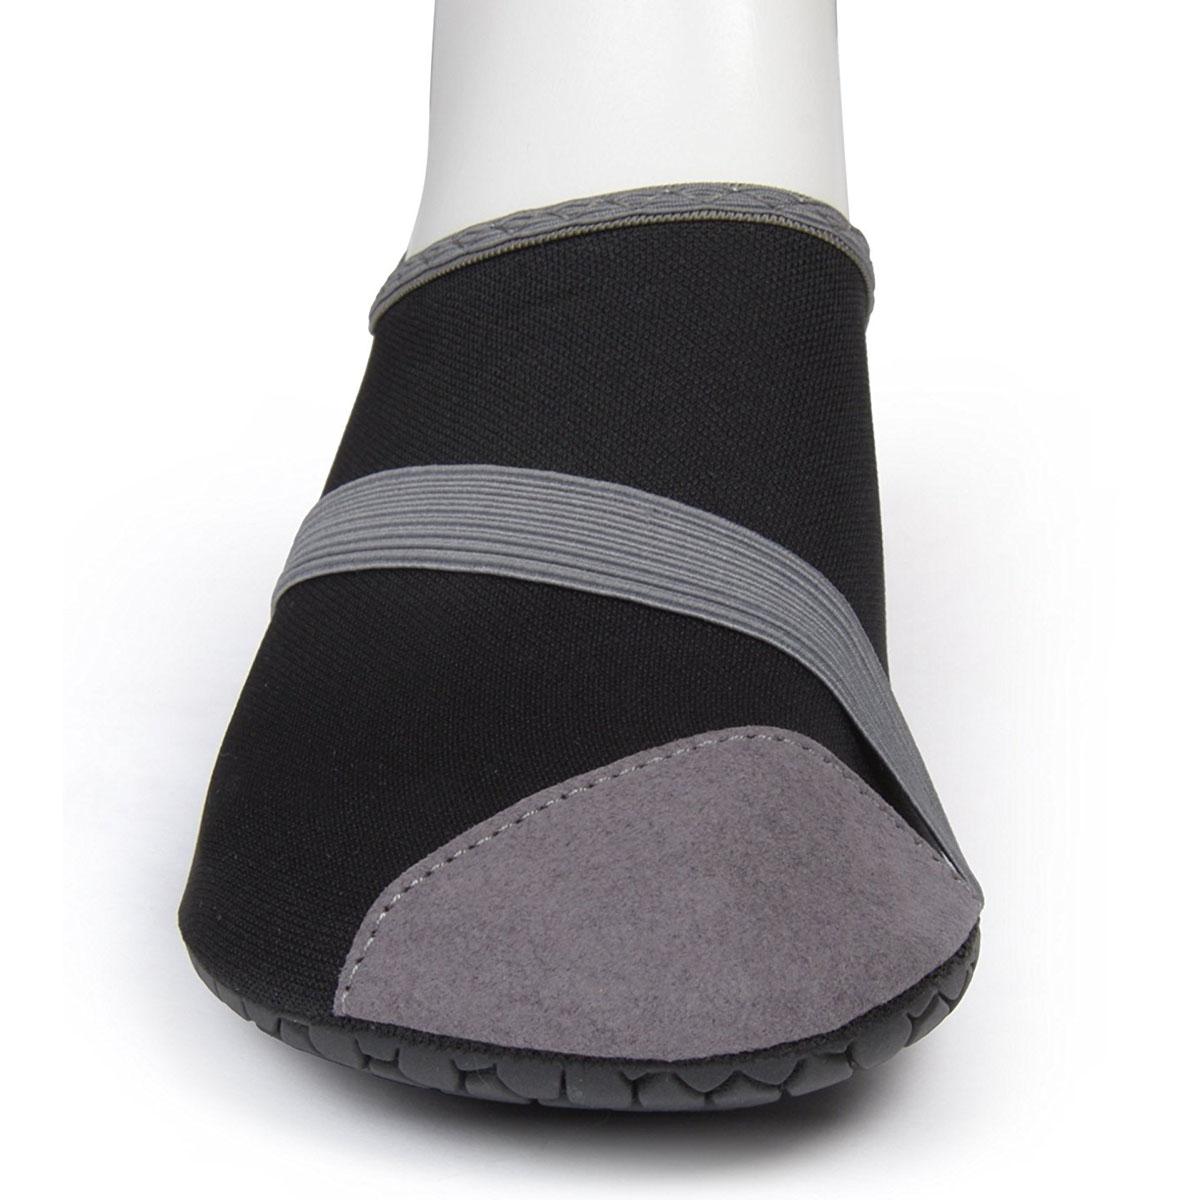 FitKicks-Women-039-s-Non-Slip-Sole-Active-Footwear thumbnail 10